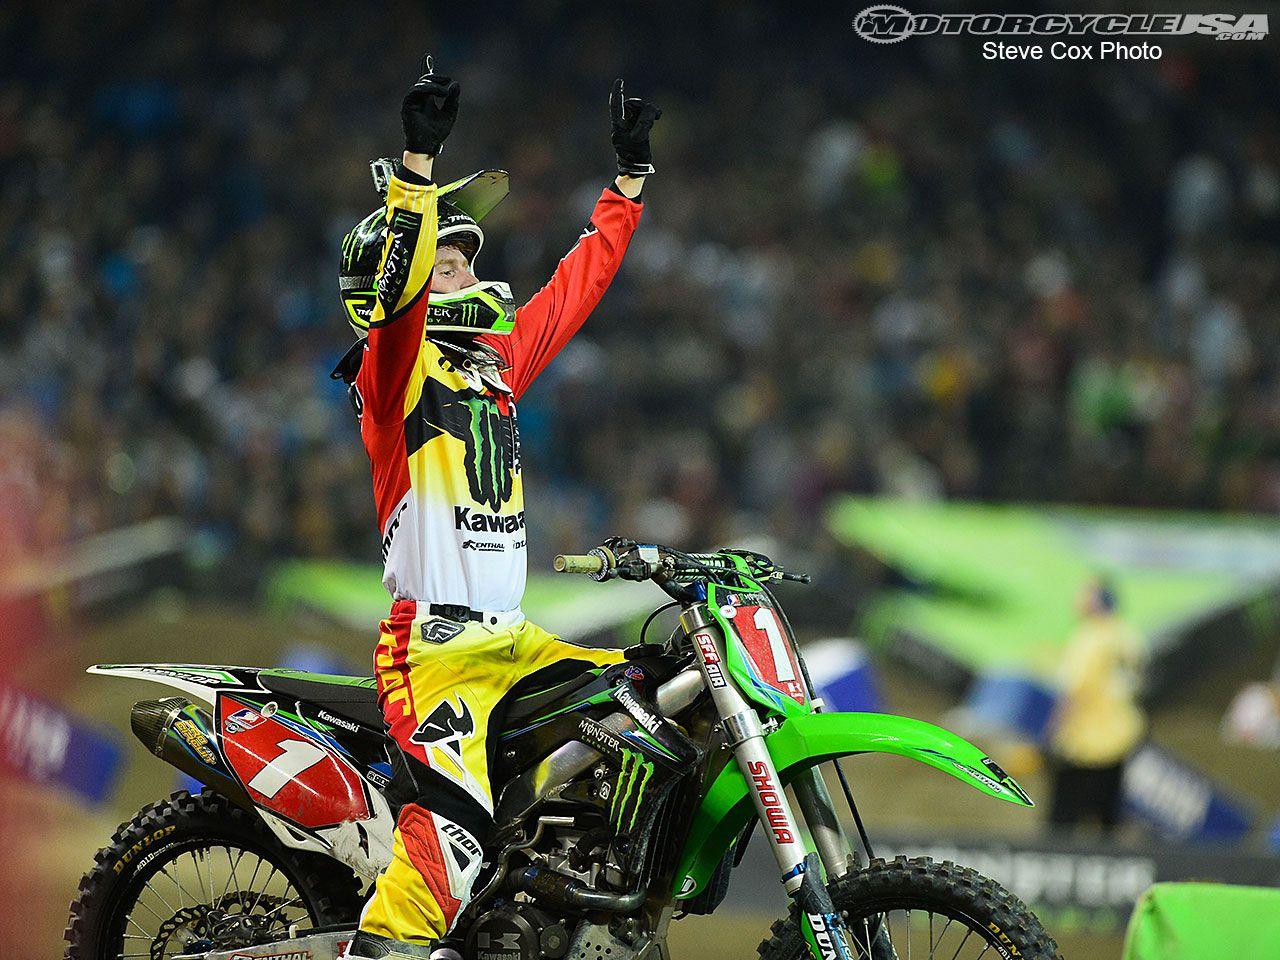 Kawasaki's Ryan Villopoto captures another win in Toronto ...